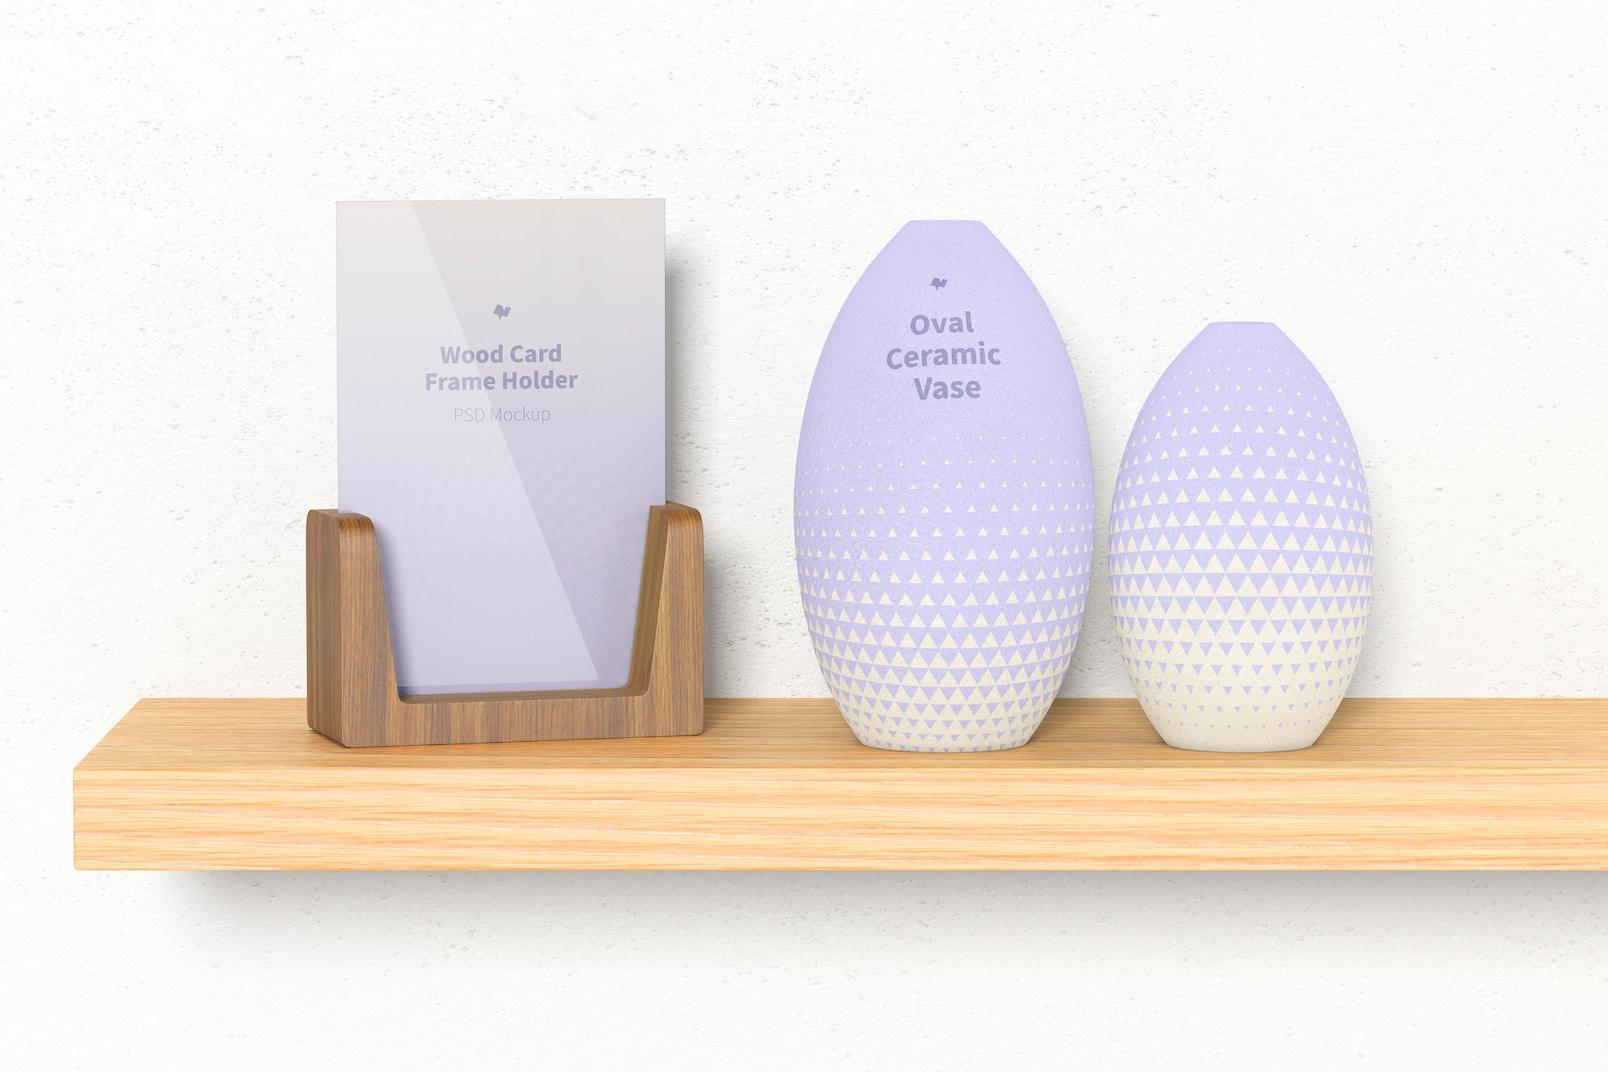 Oval Ceramic Vase Set Mockup, on Shelf